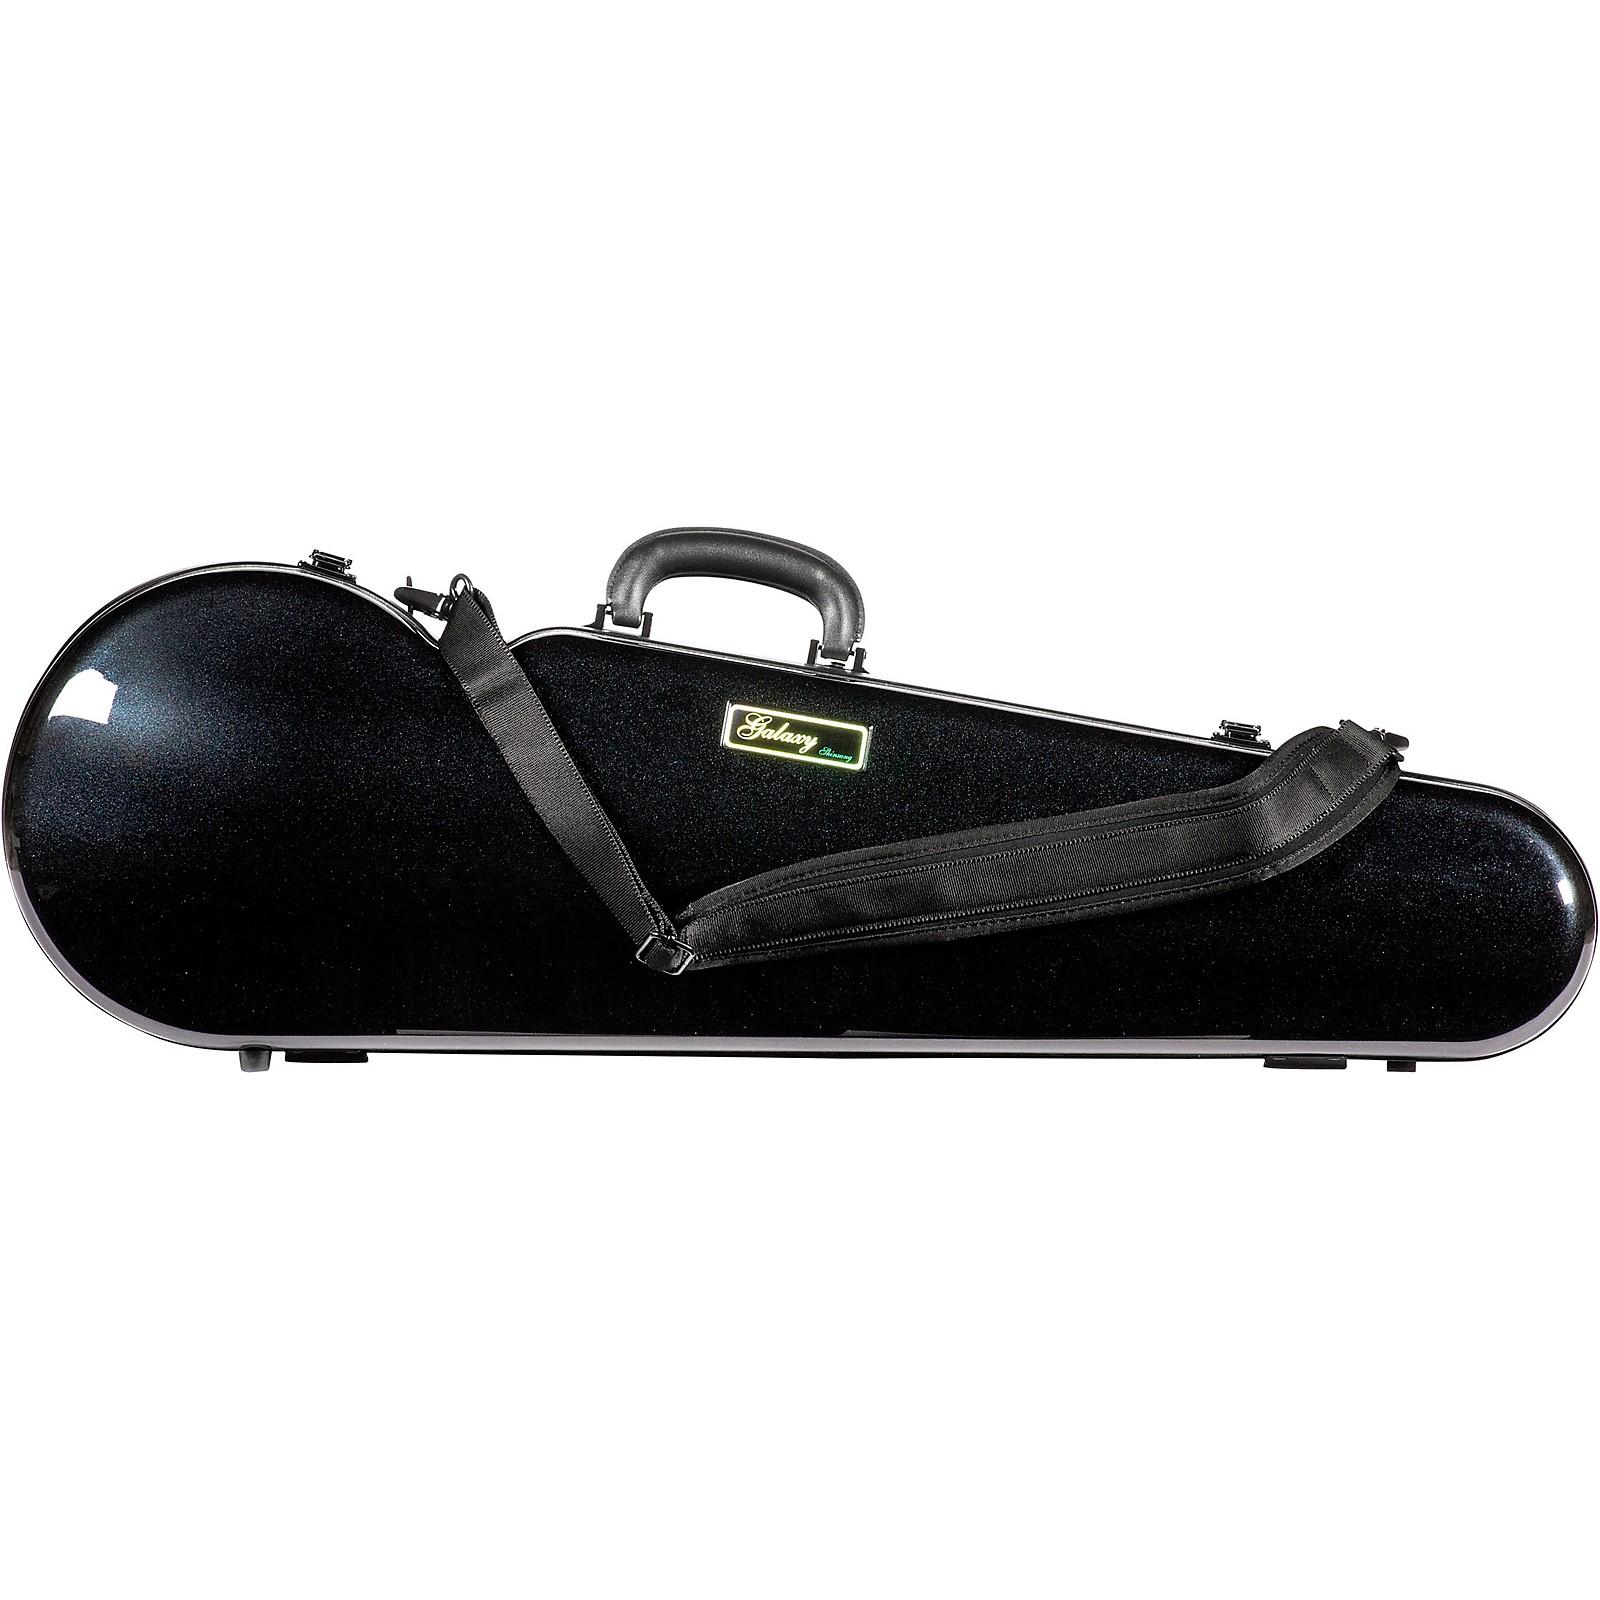 Galaxy Cases Comet 300SL Series Shaped ABS Violin Case